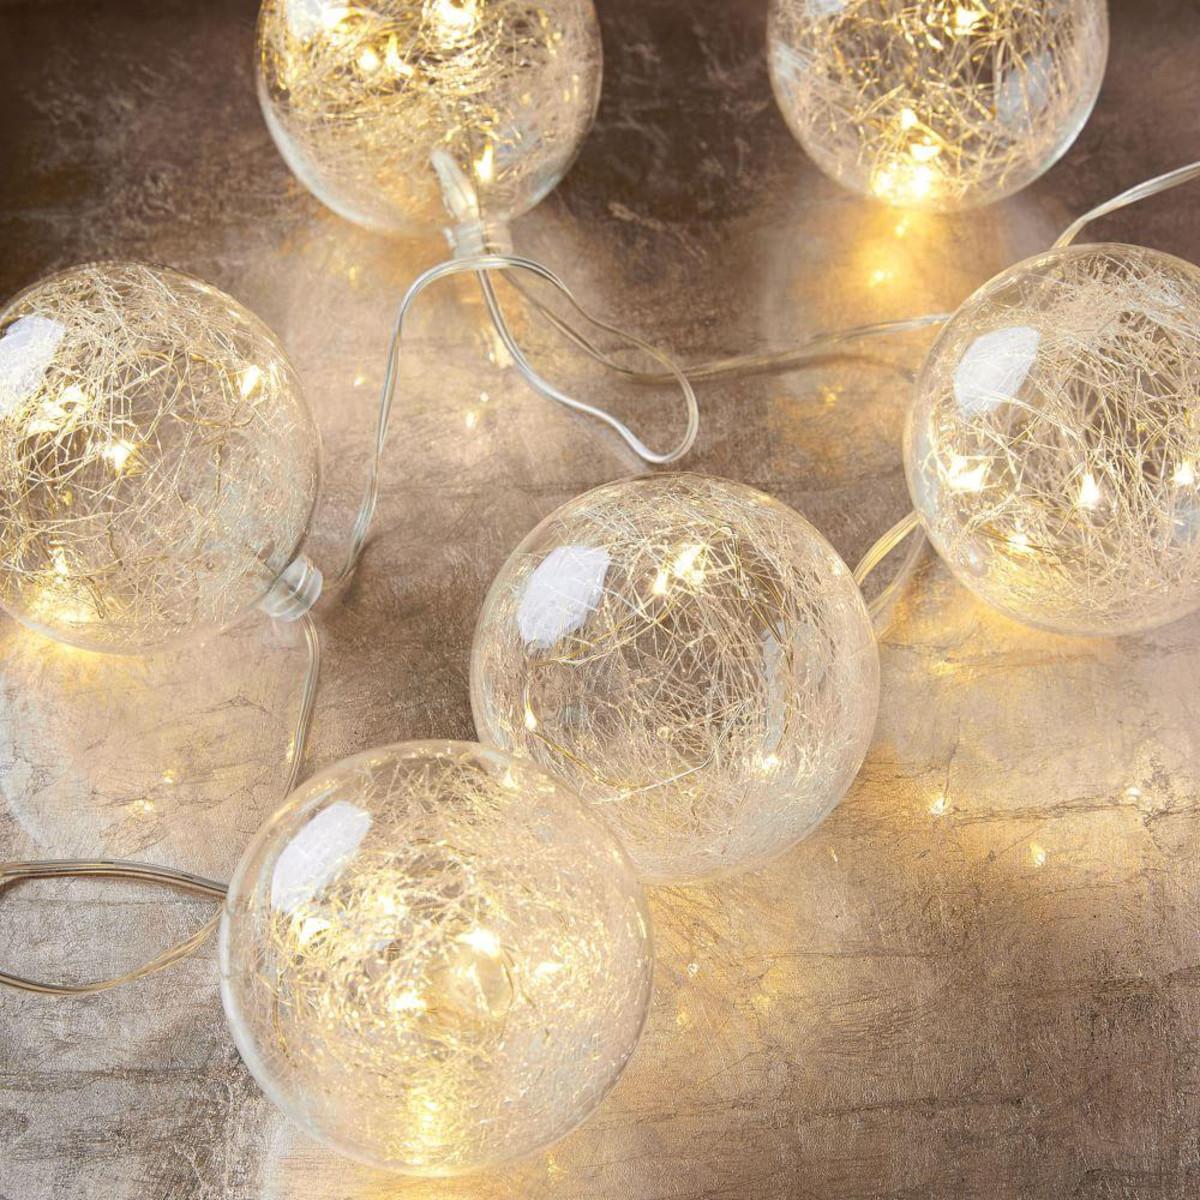 led-string-lights-silver-clip-d4748-z.jpg